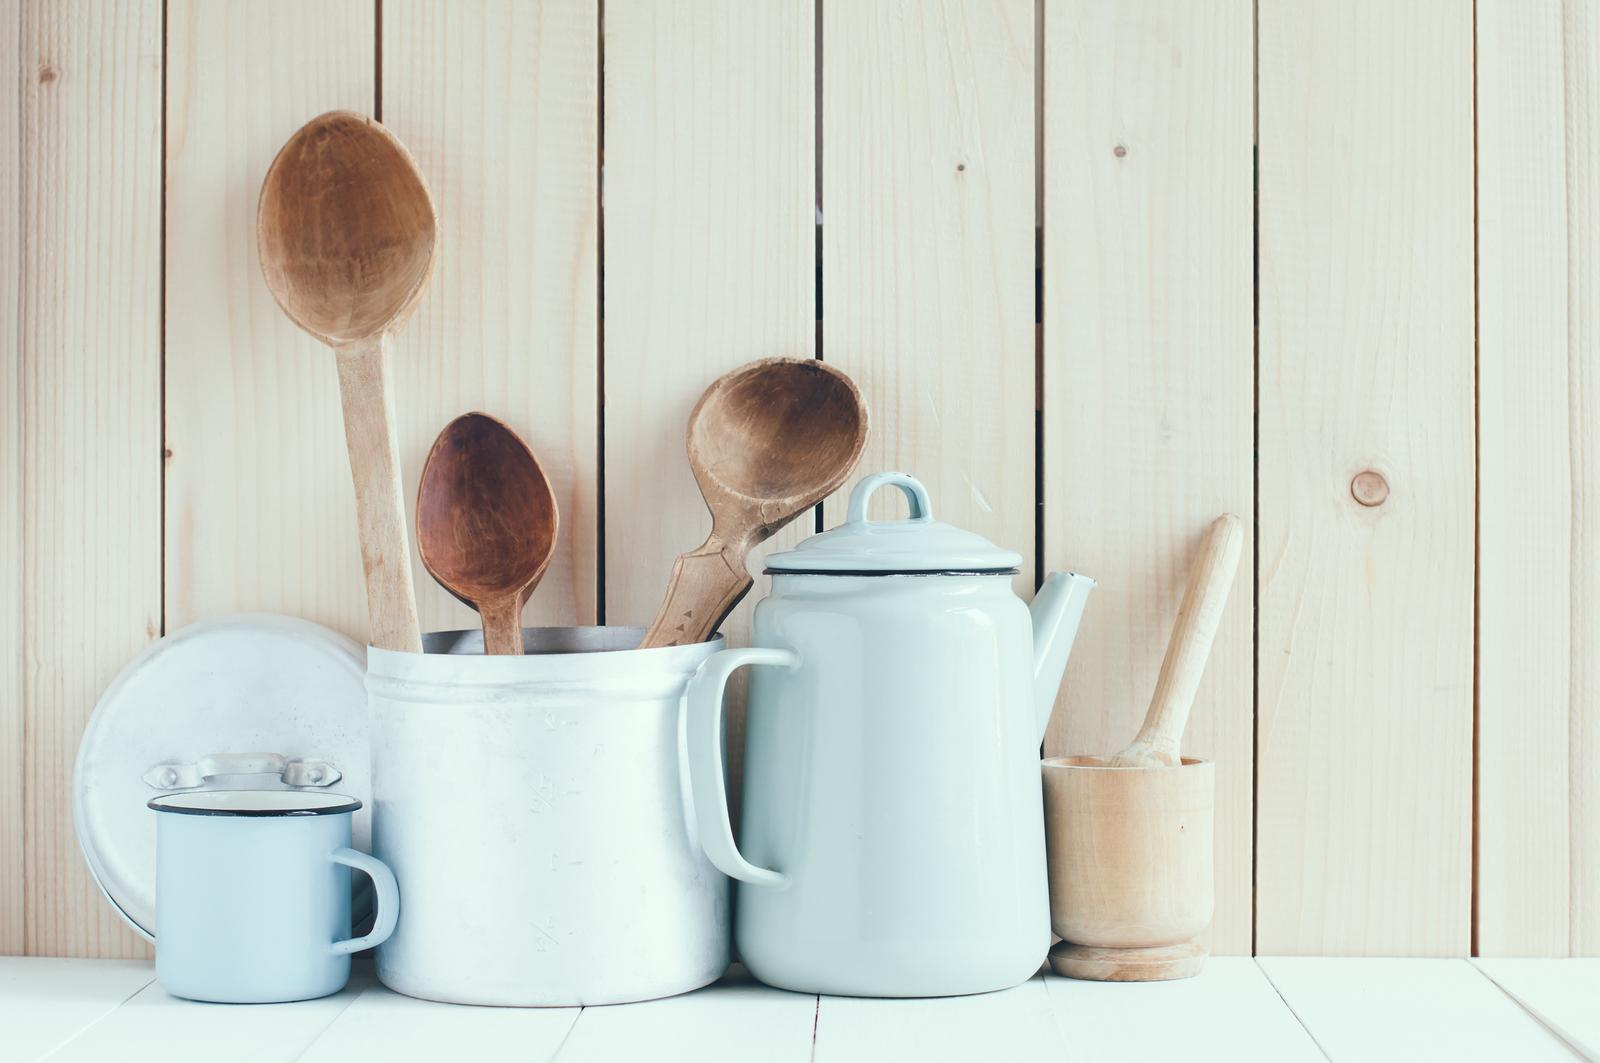 Bare Naked Botanicals - The Kitchen